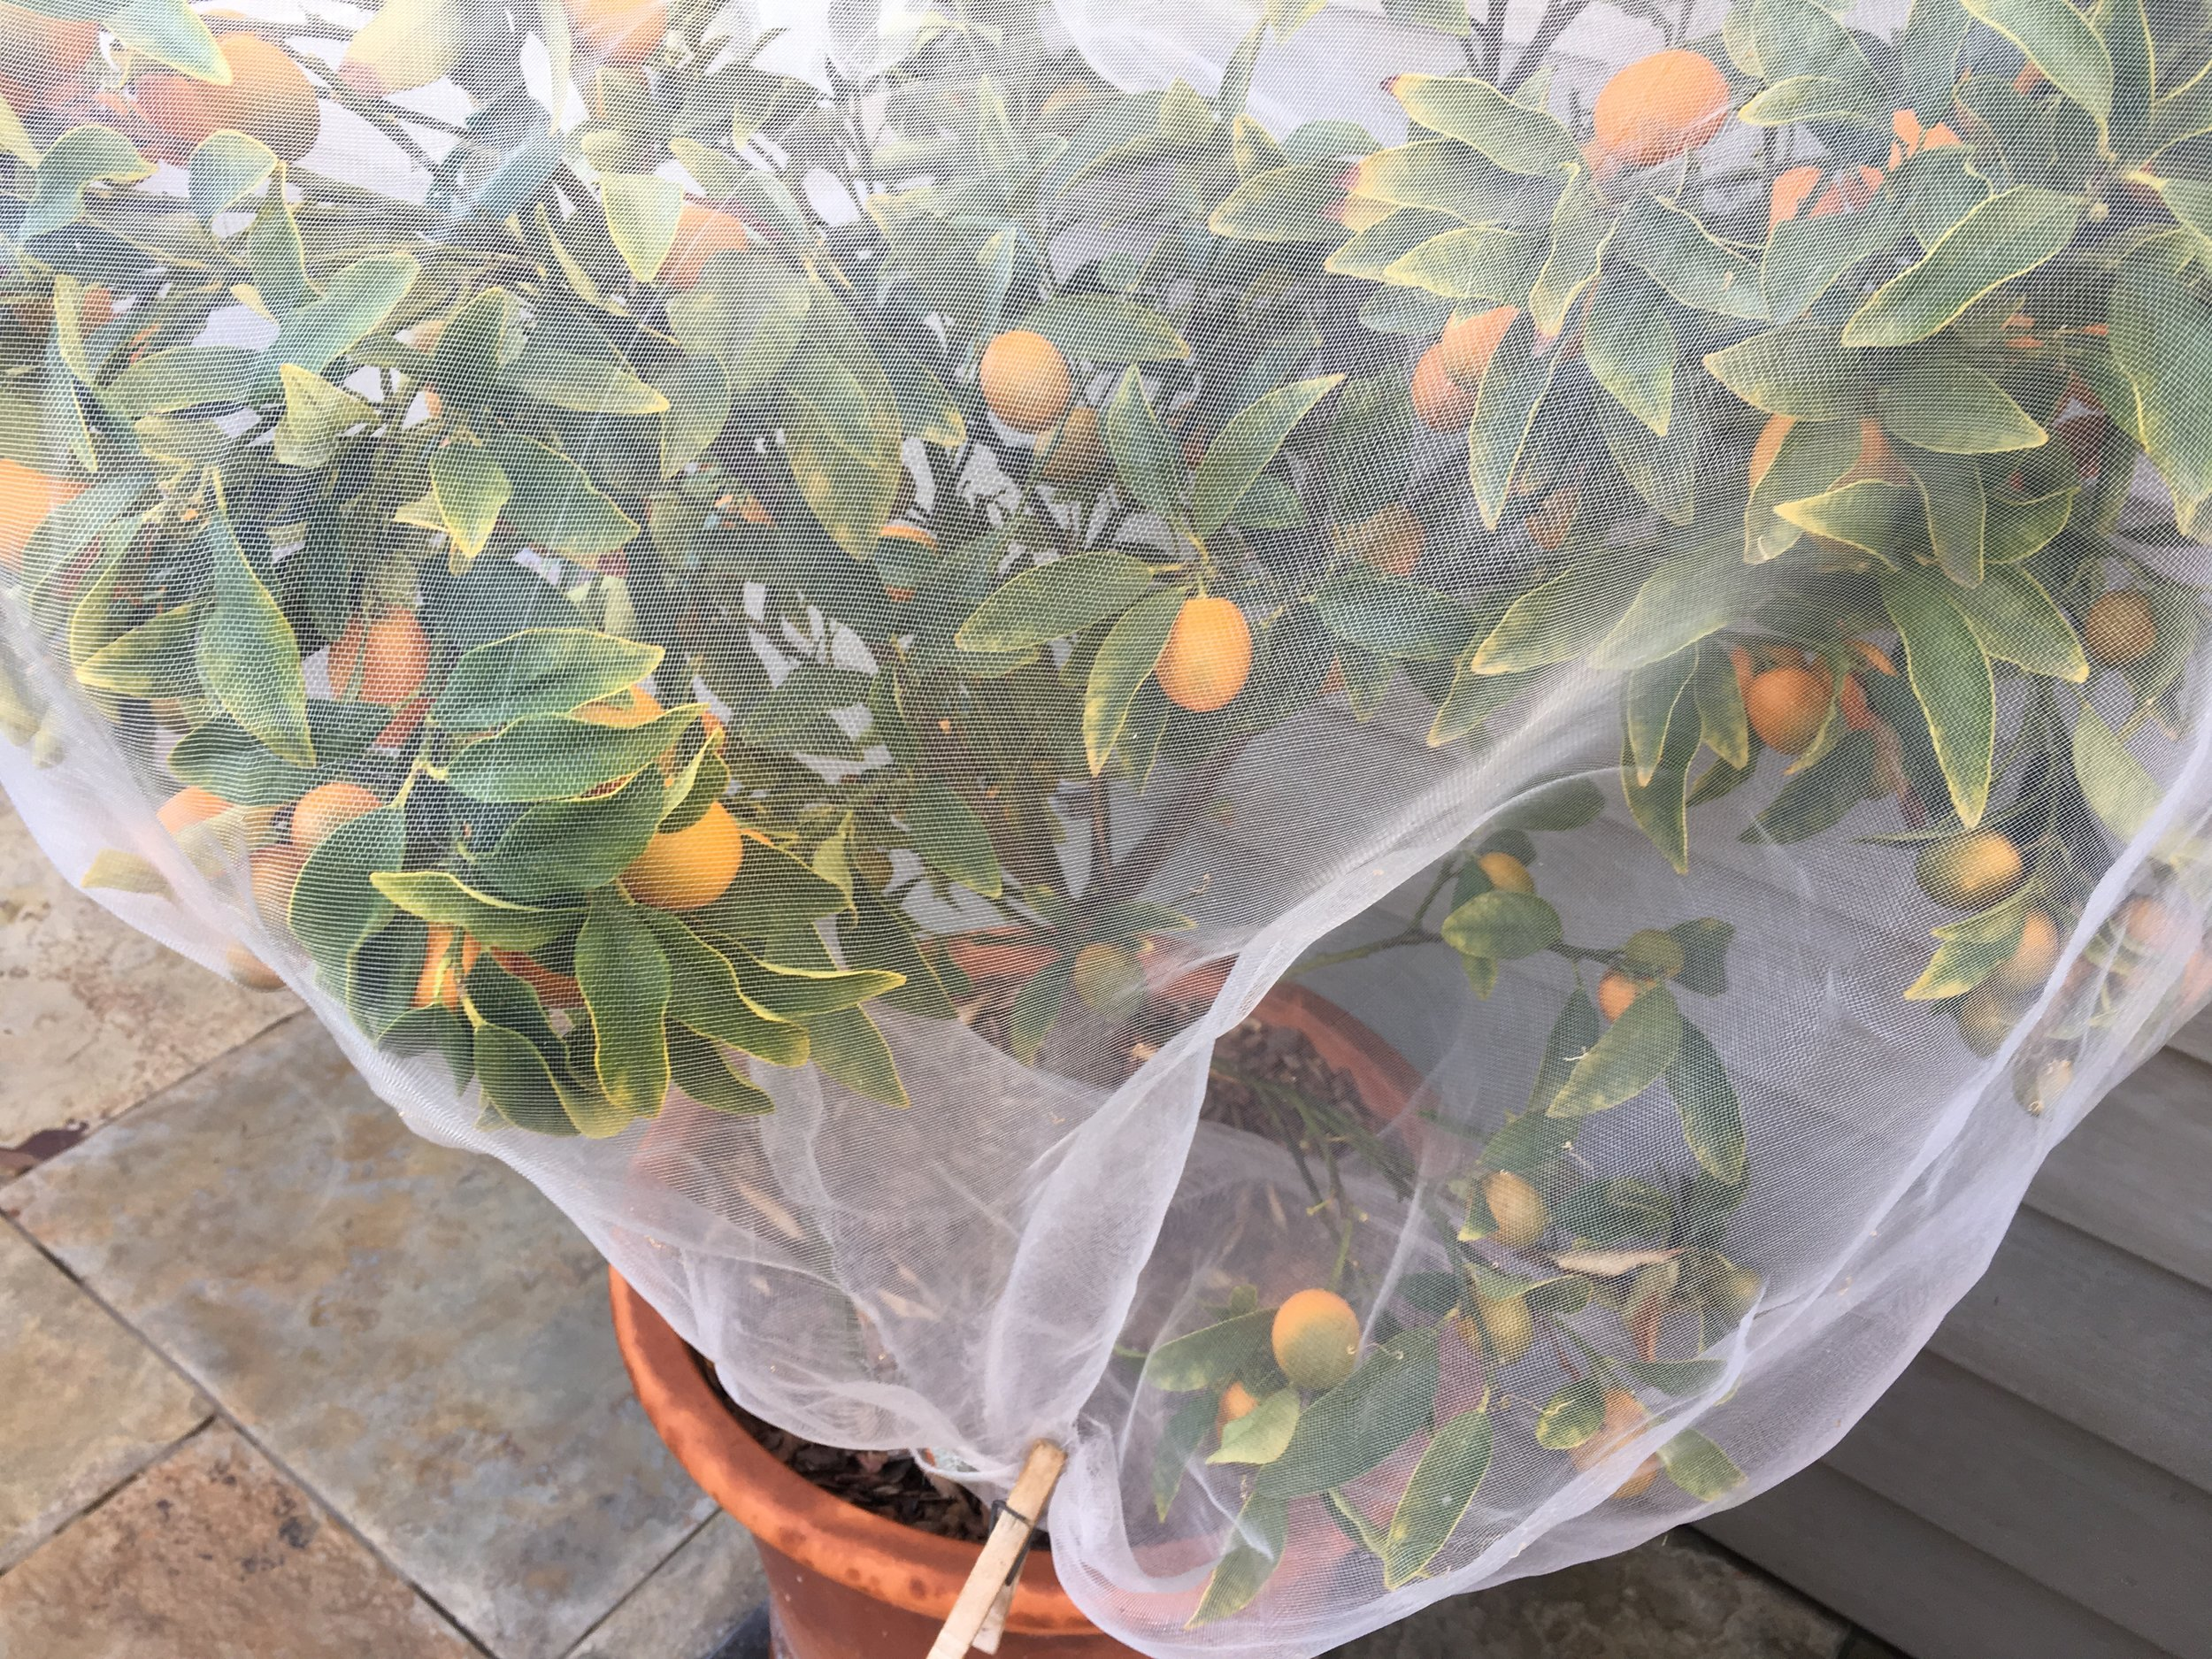 Kumquats with bird protection